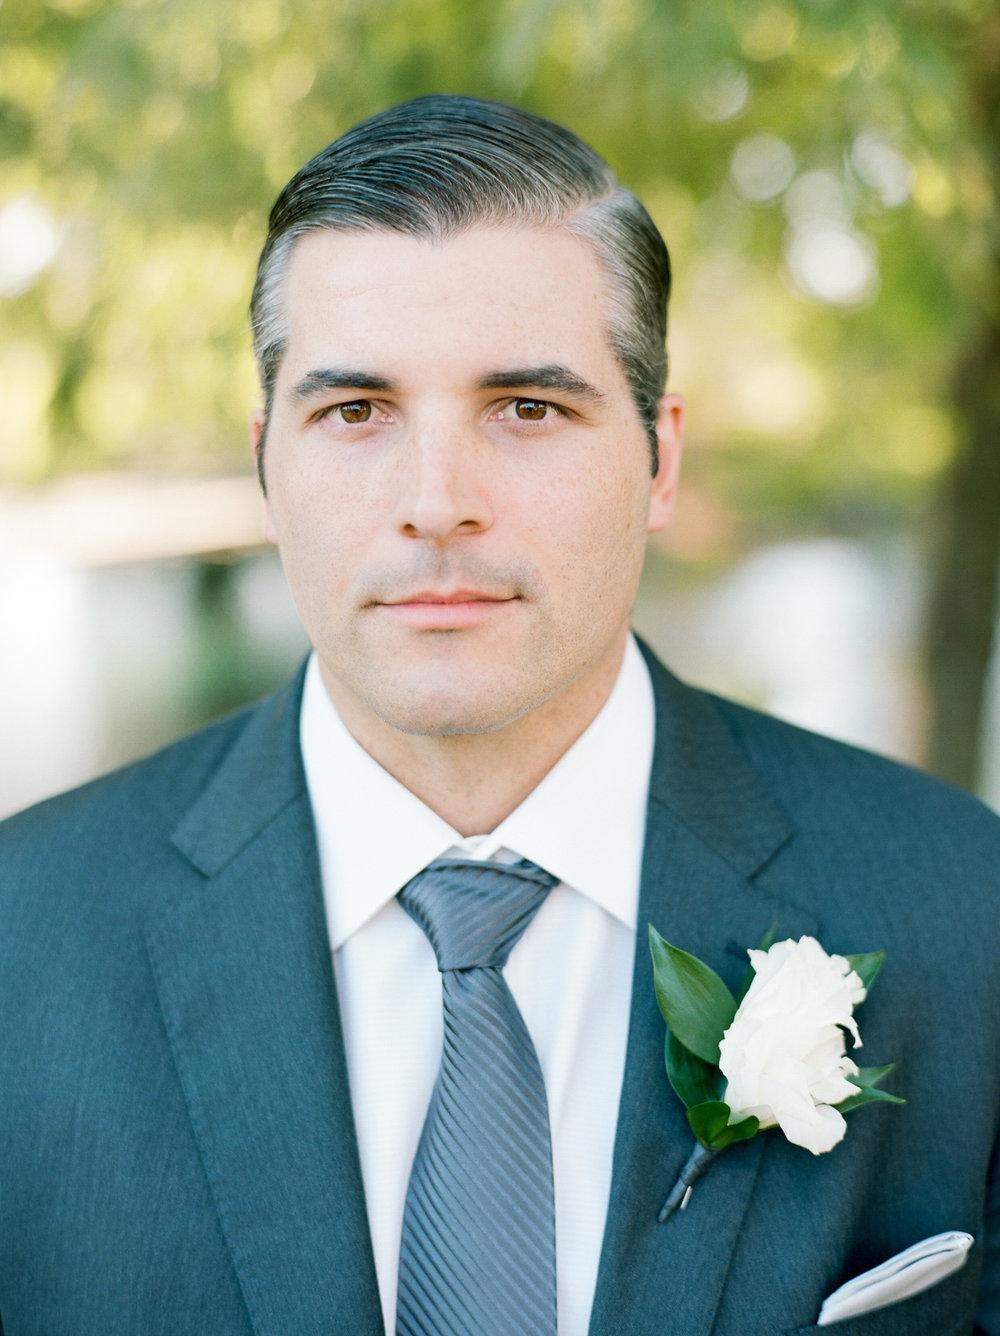 Houston-Wedding-Photographer-Lakeside-Country-Club-First-Look-Bride-Groom-Formals-Film-Fine-Art-Photography-16.jpg